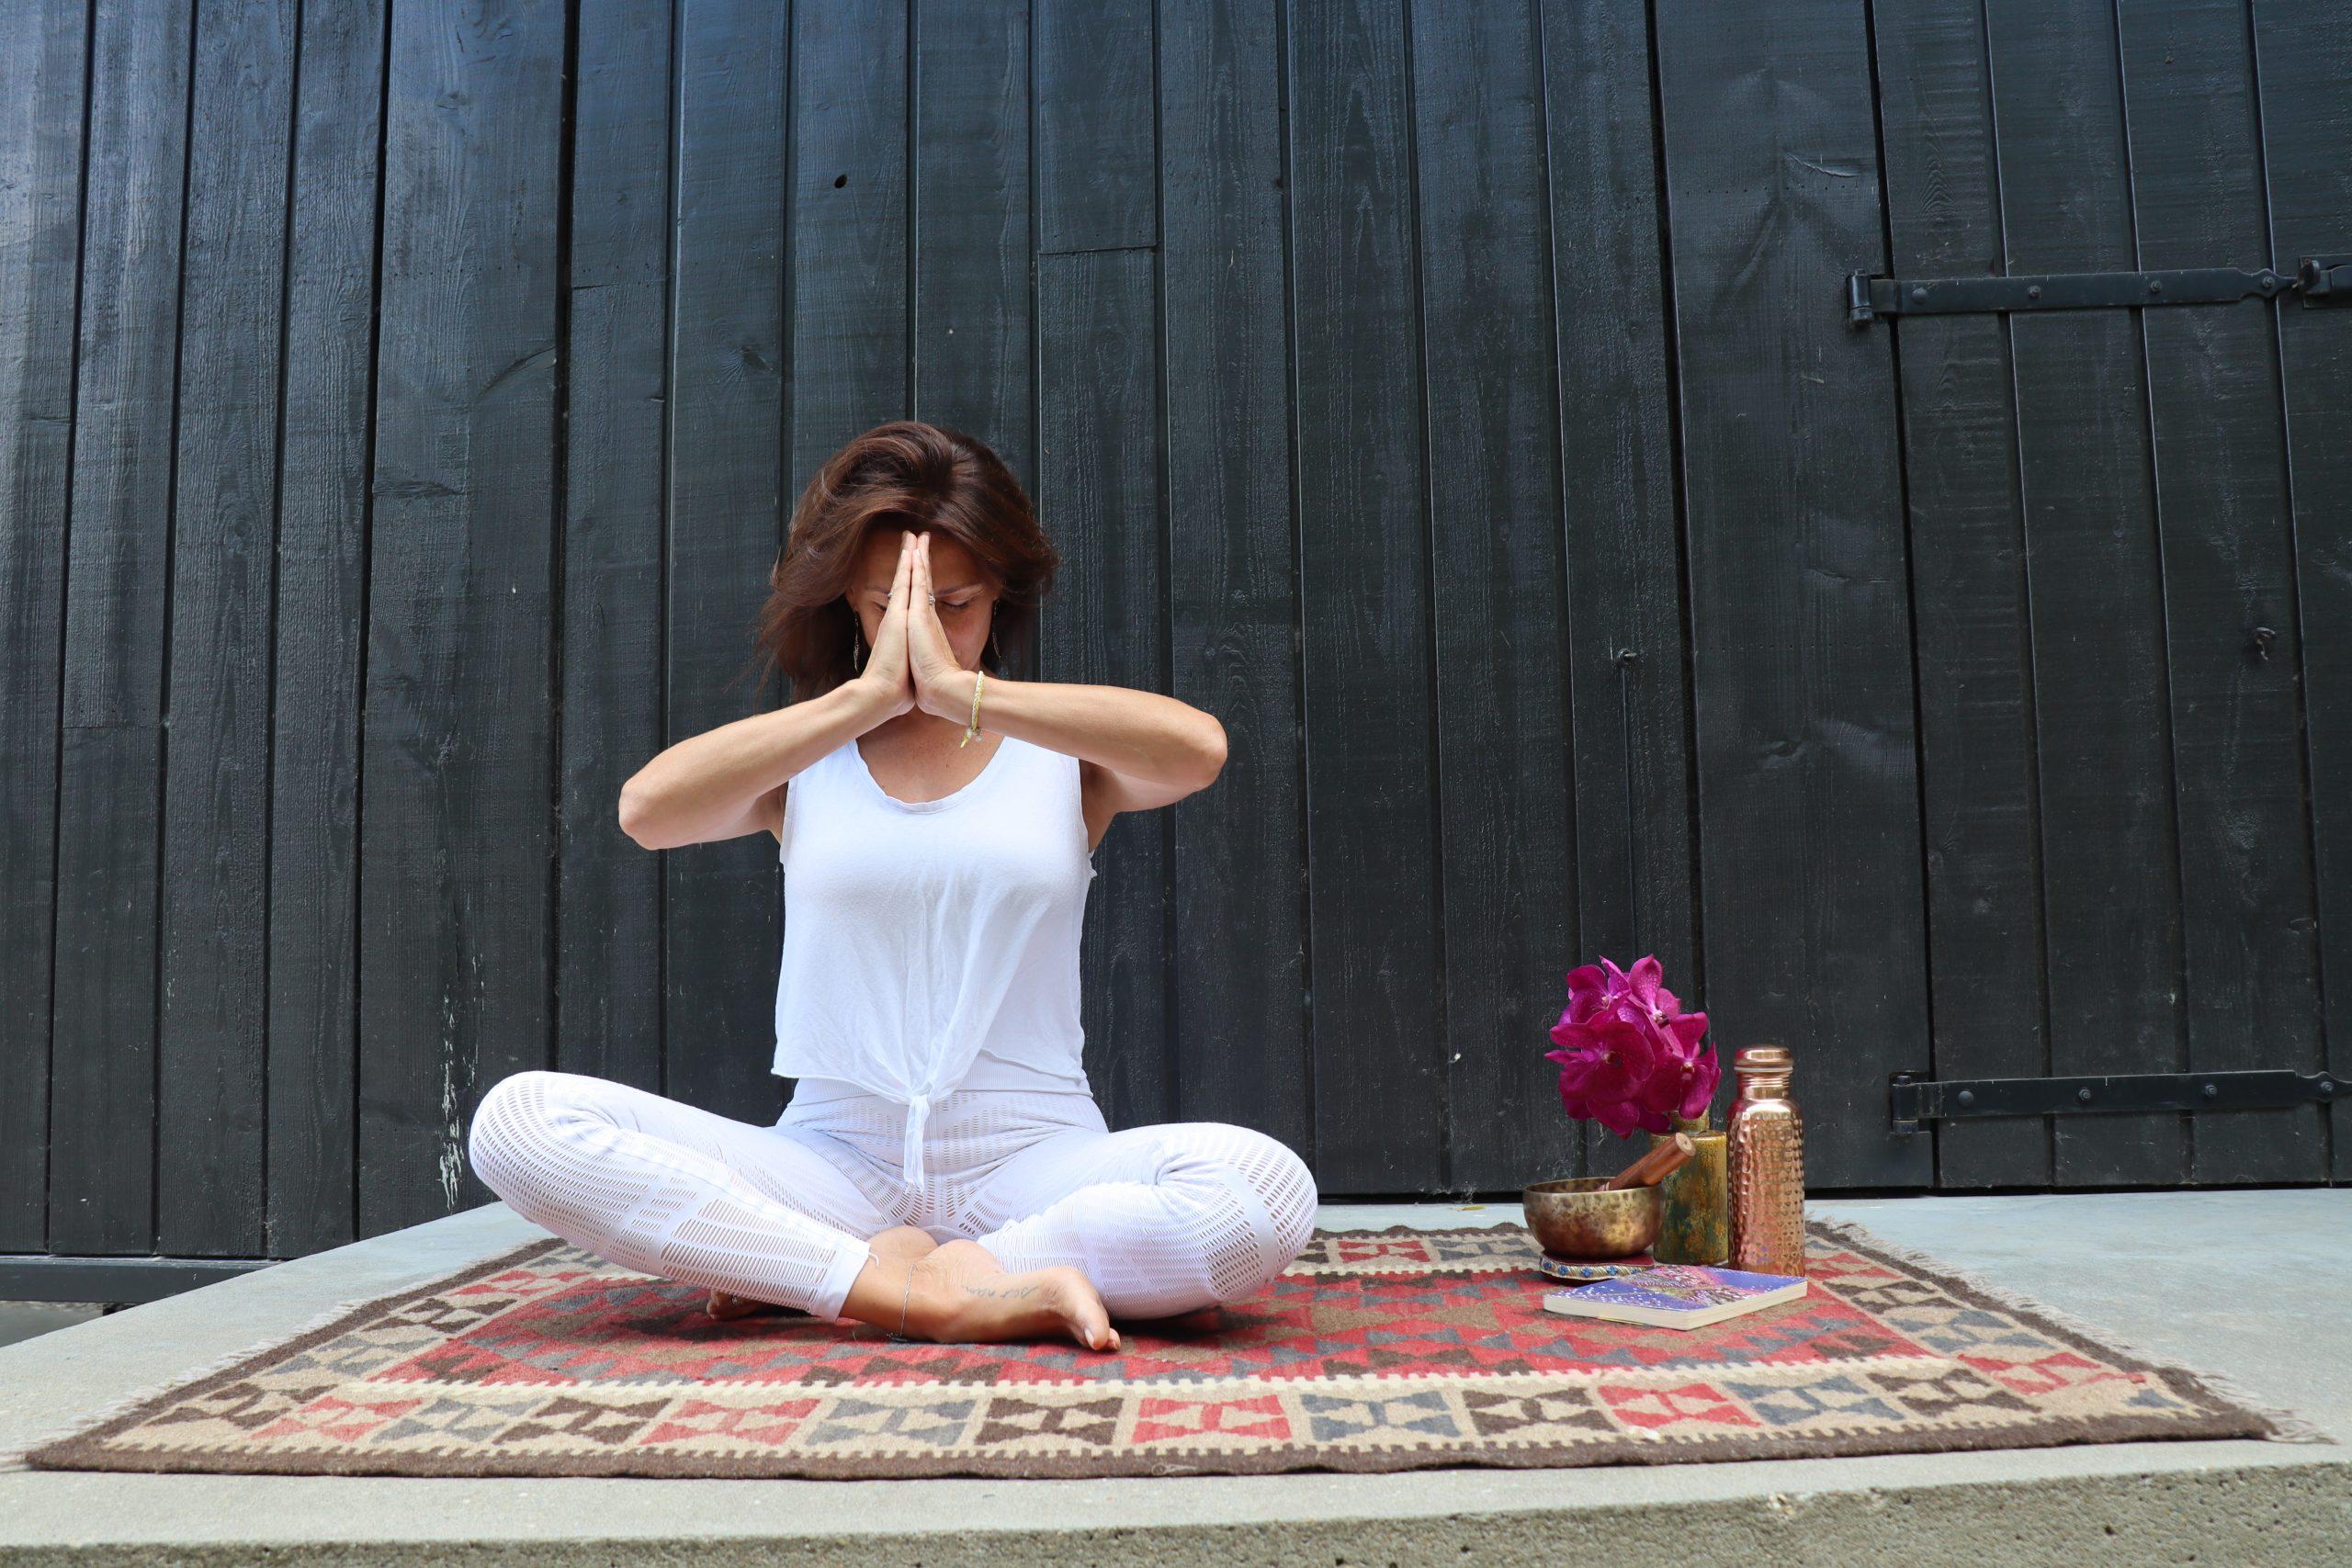 Yogapepper hulp bij ontrouw